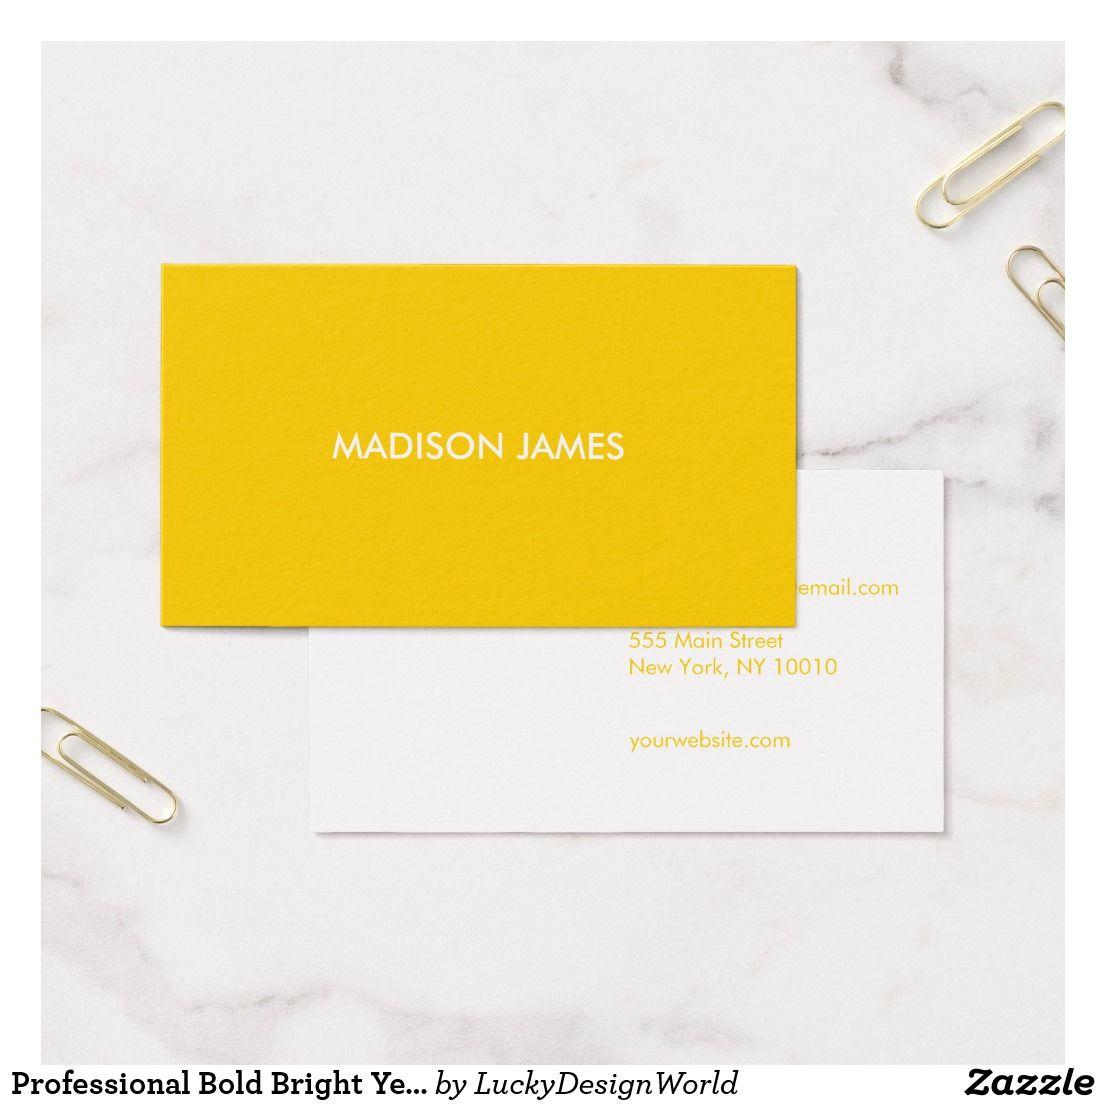 Interior Designbusiness: Professional Bold Bright Yellow Minimalist Modern Business